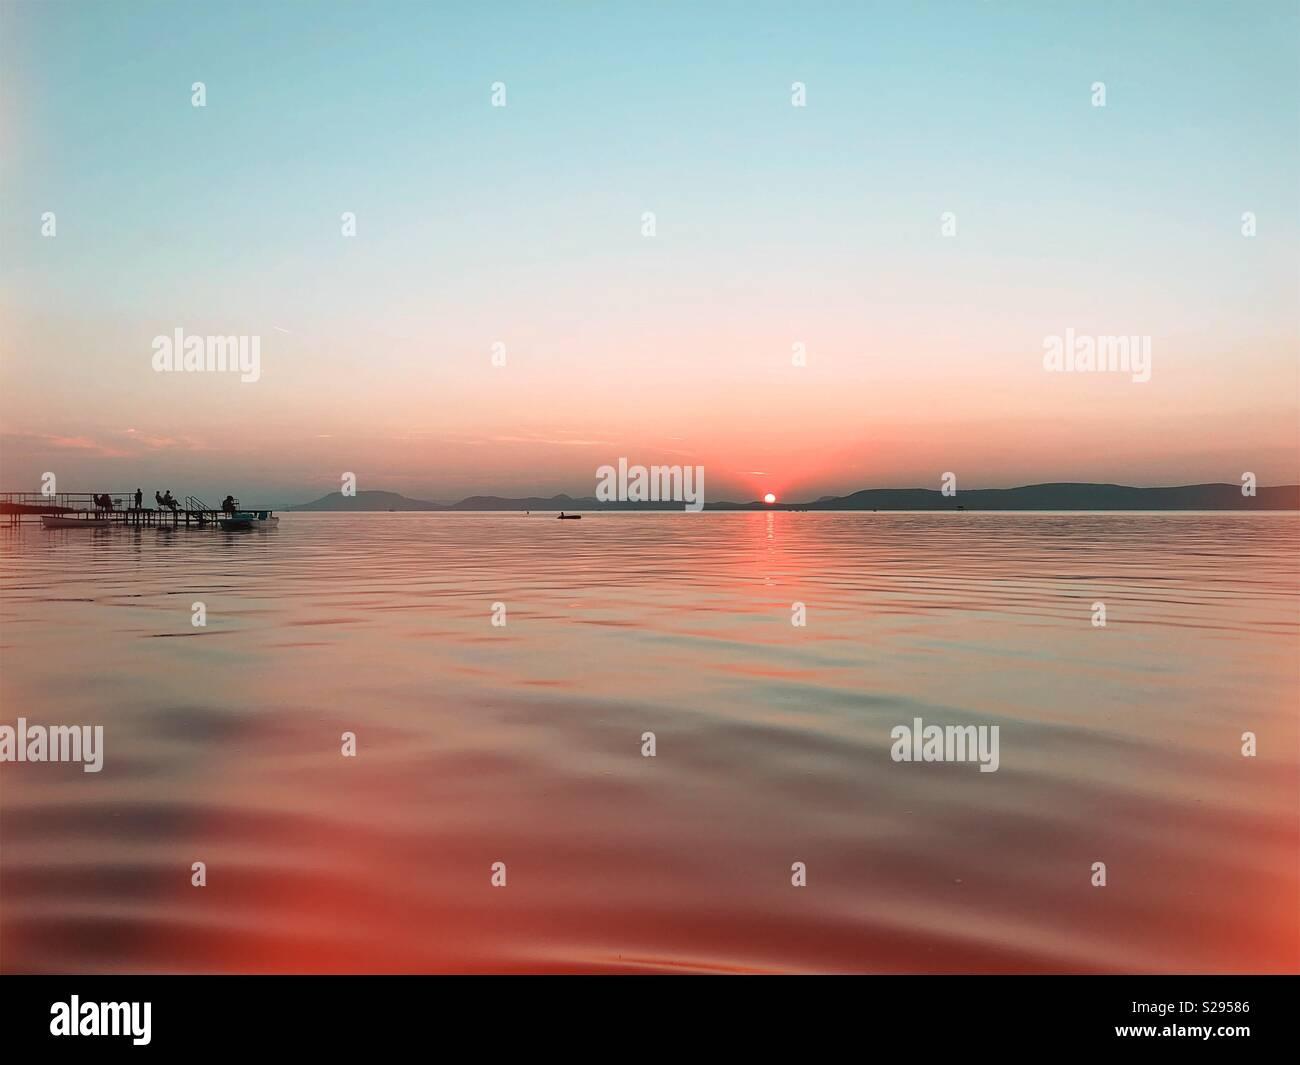 Brennenden Sonnenuntergang über ruhiges Wasser - Balaton Stockbild